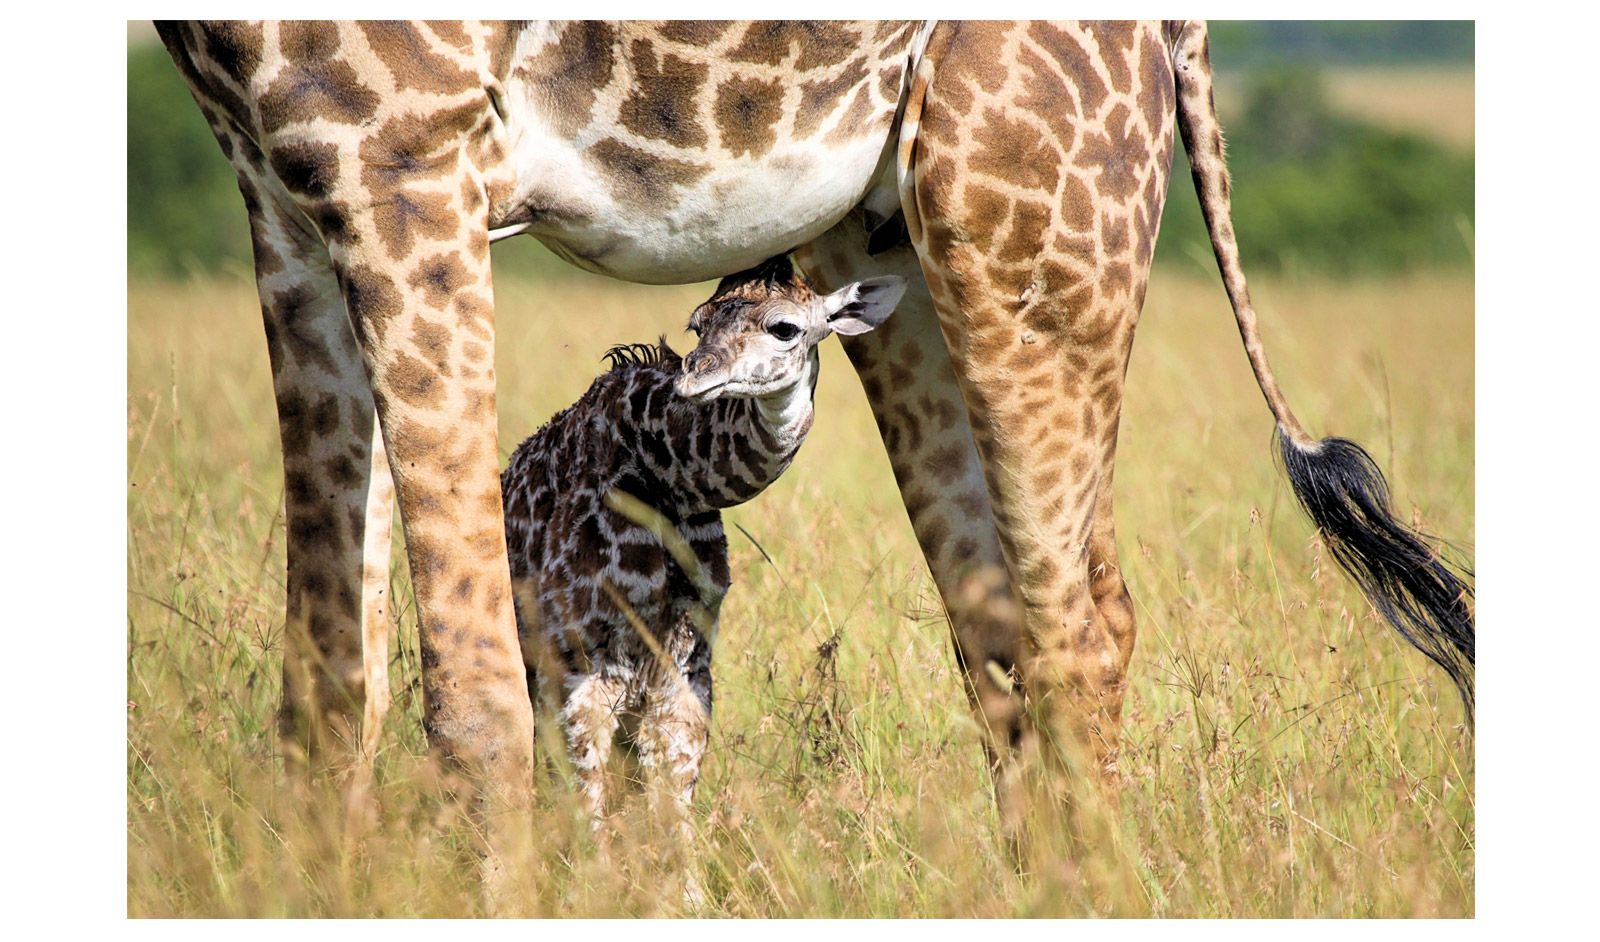 Jet-van-Och_Masai-Mara-newborn-giraffe